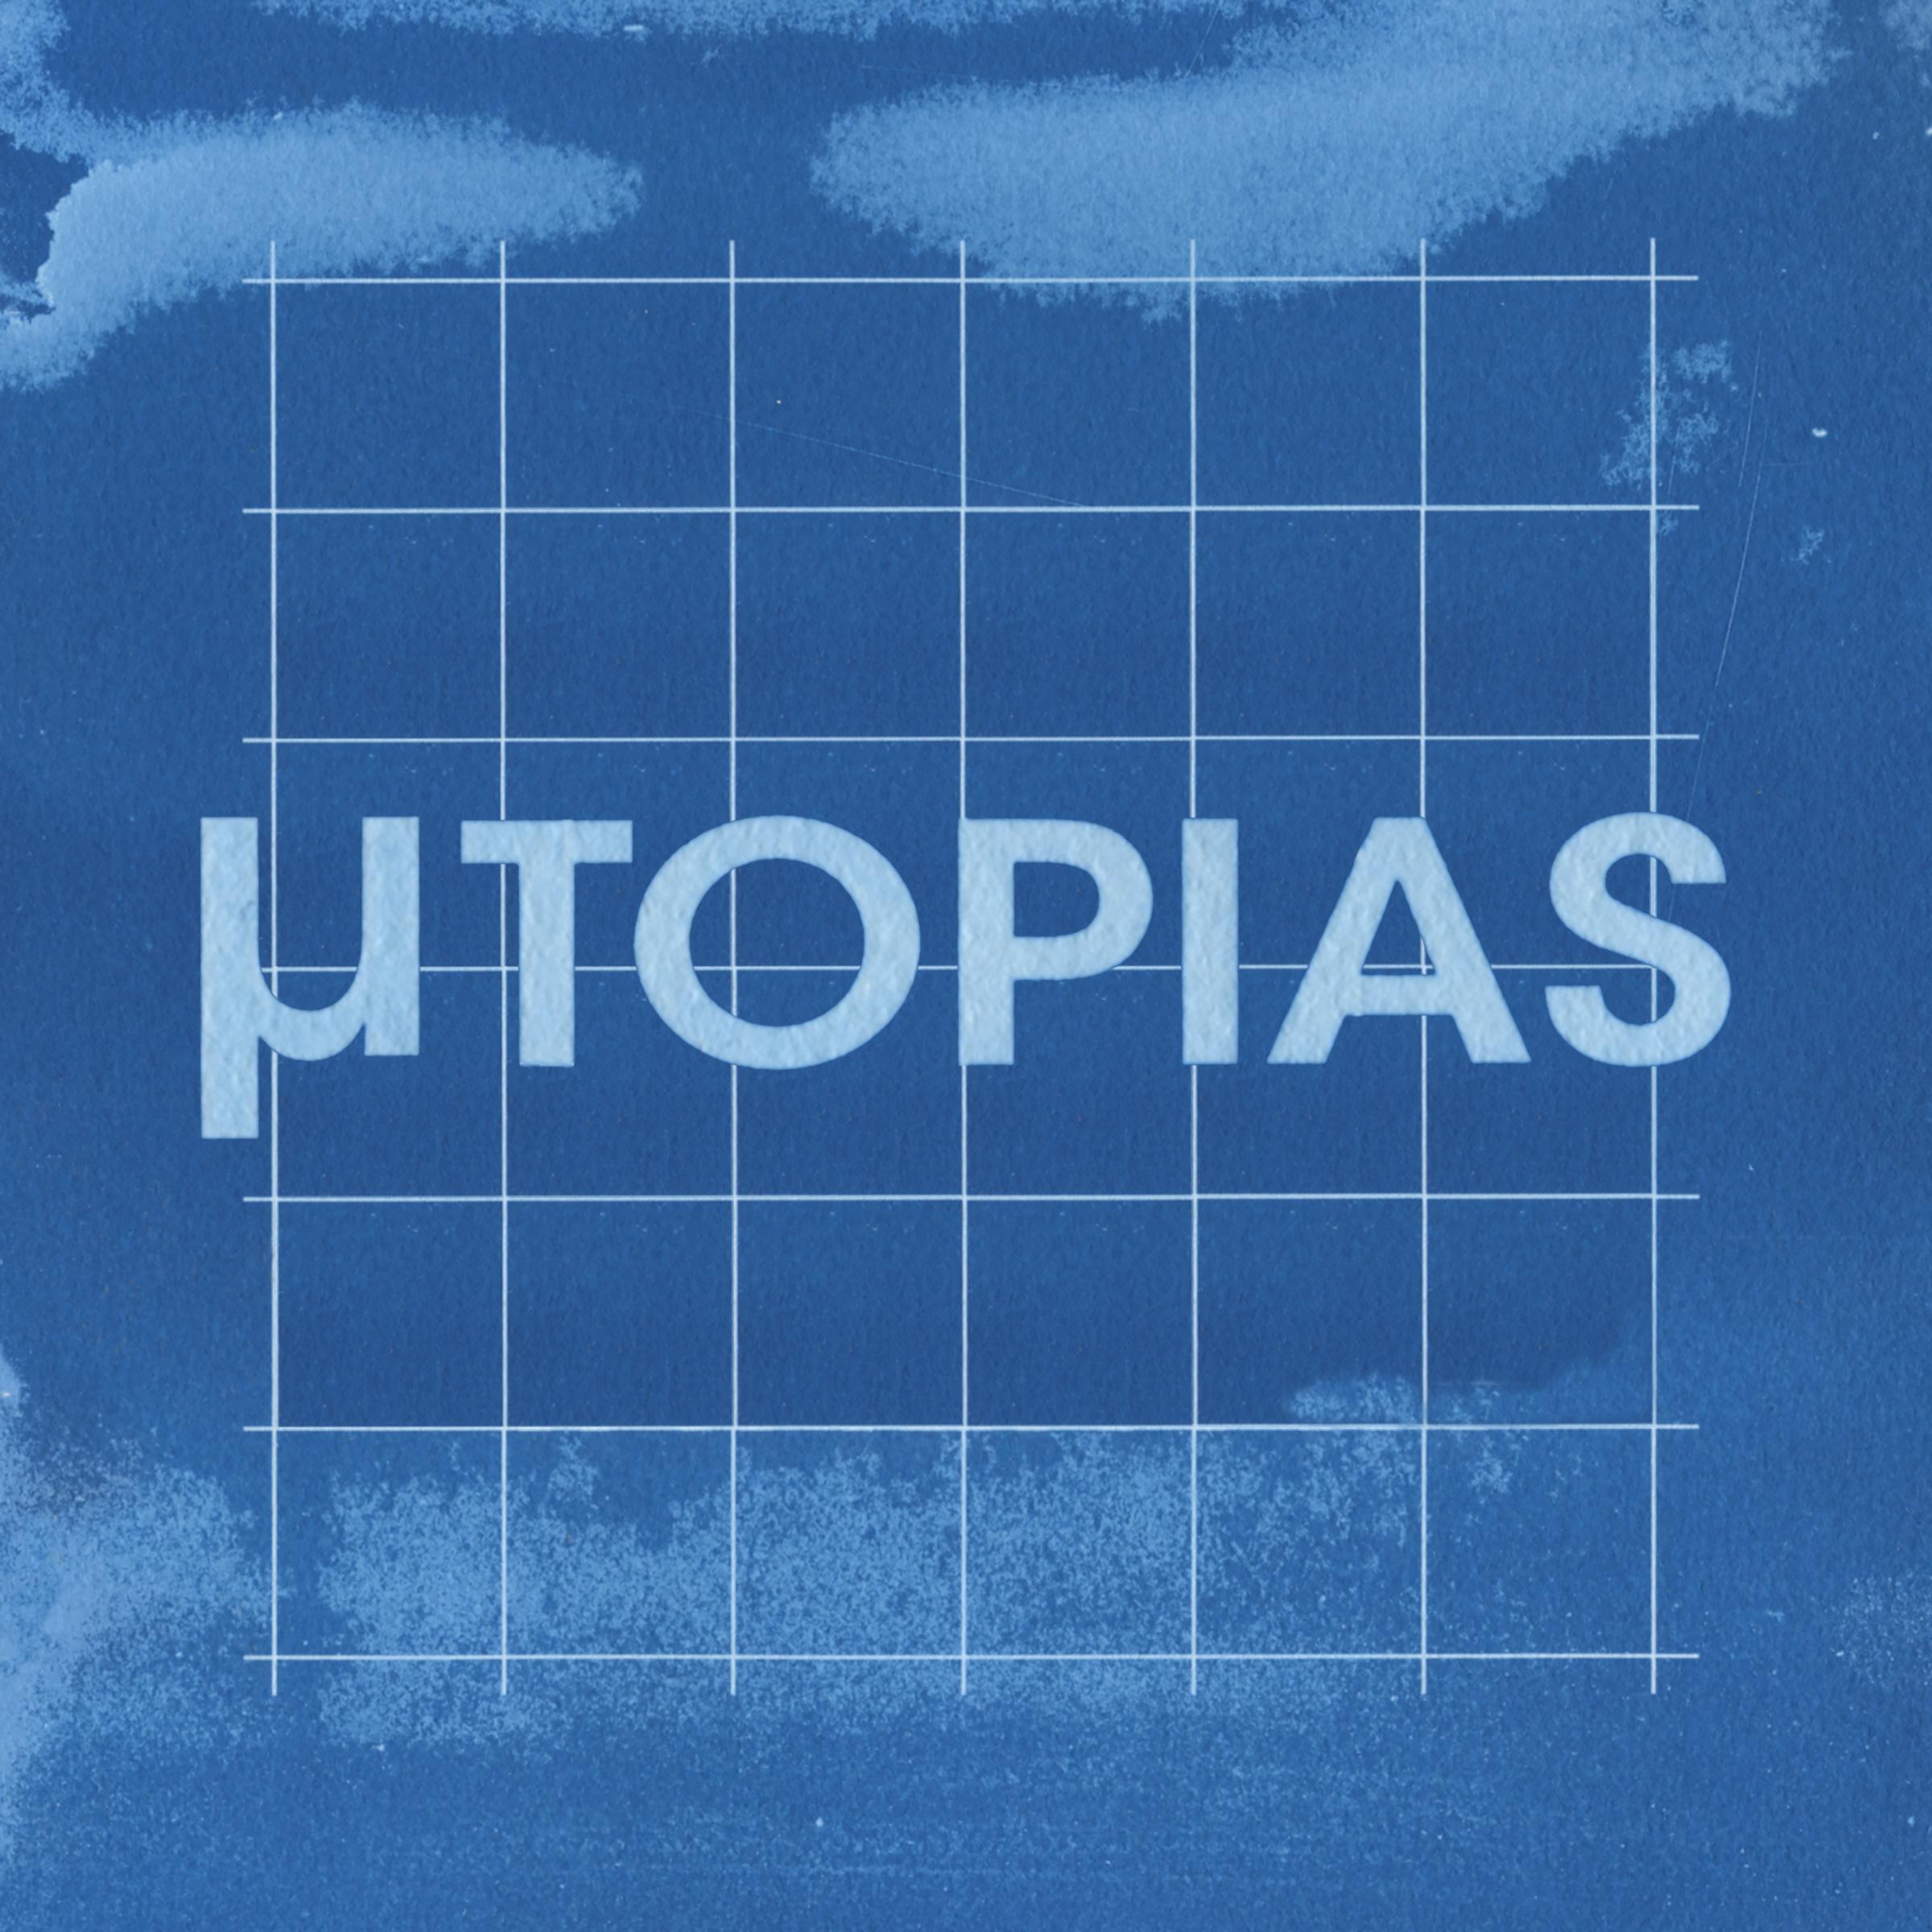 V-2018-1_2L-141_UTOPIAS.png